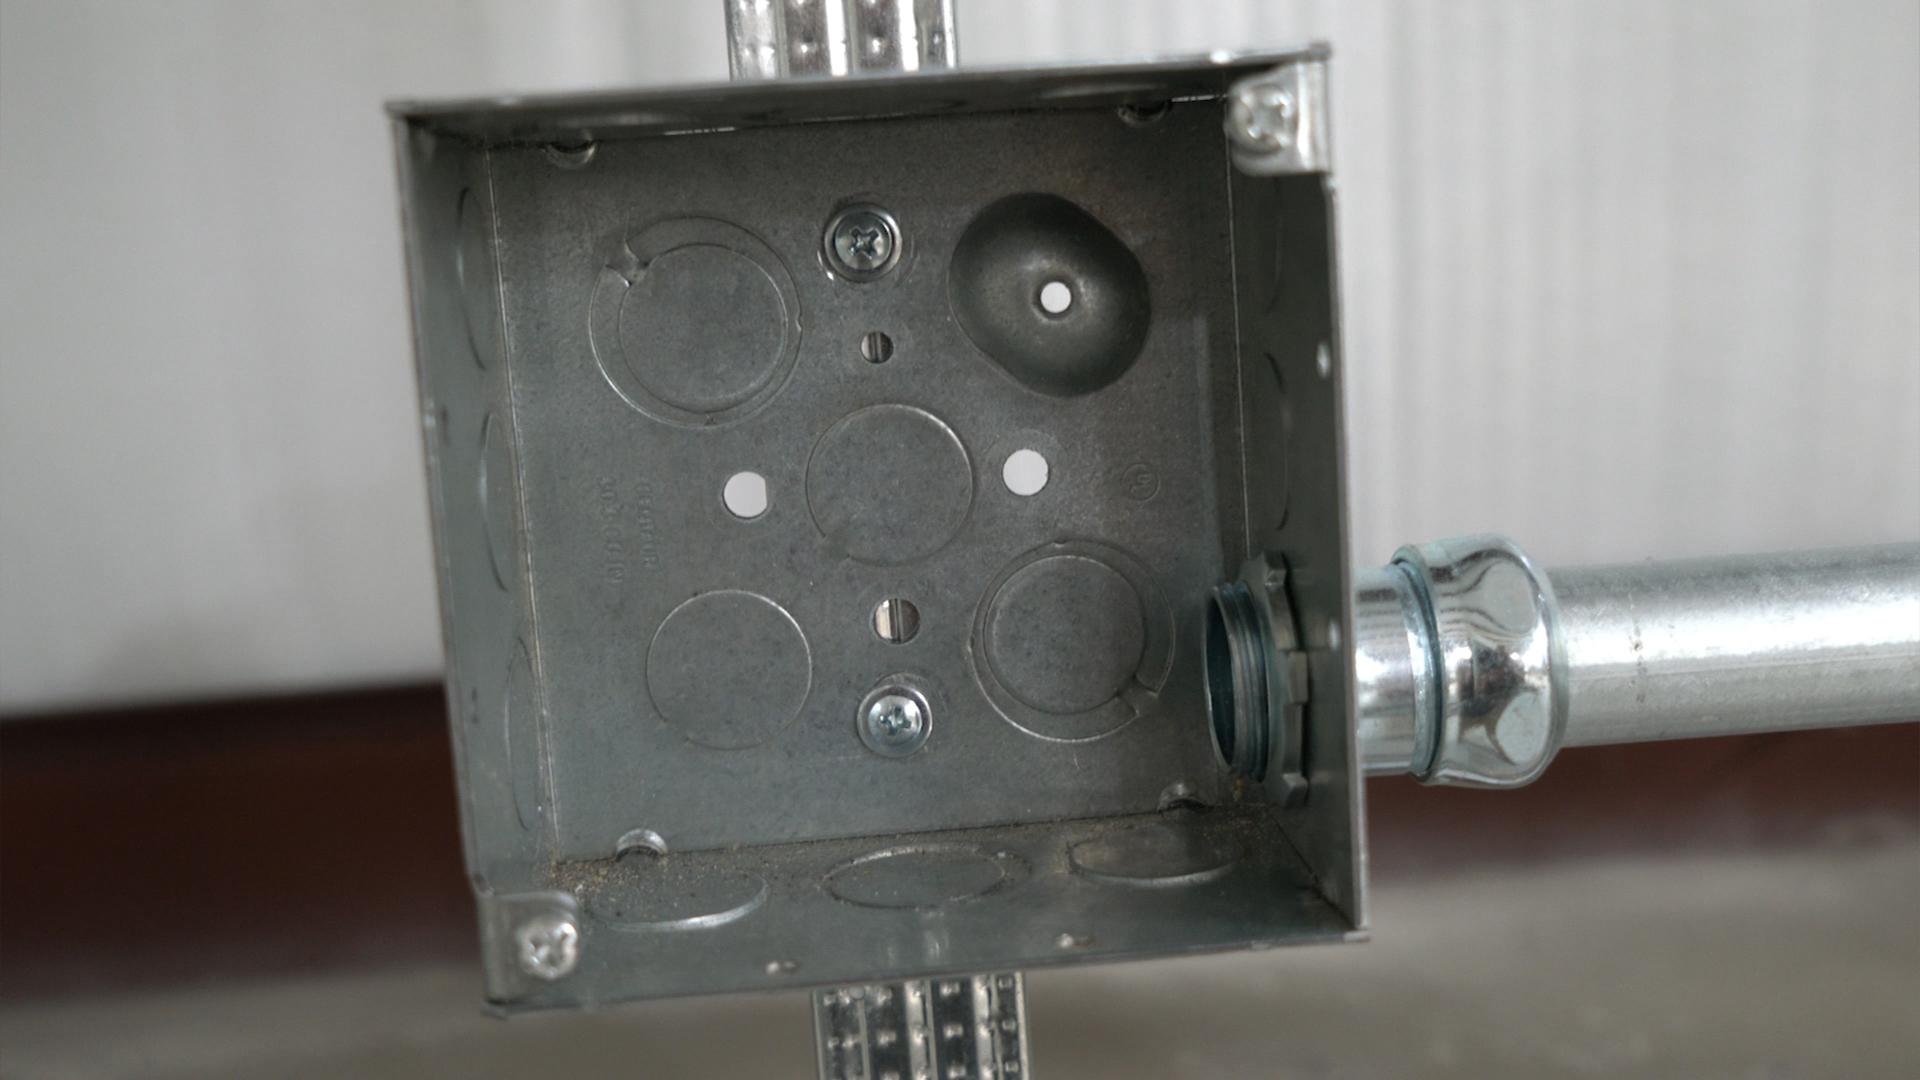 EMT-conduit-rain-tight-connector-indoor-fitting